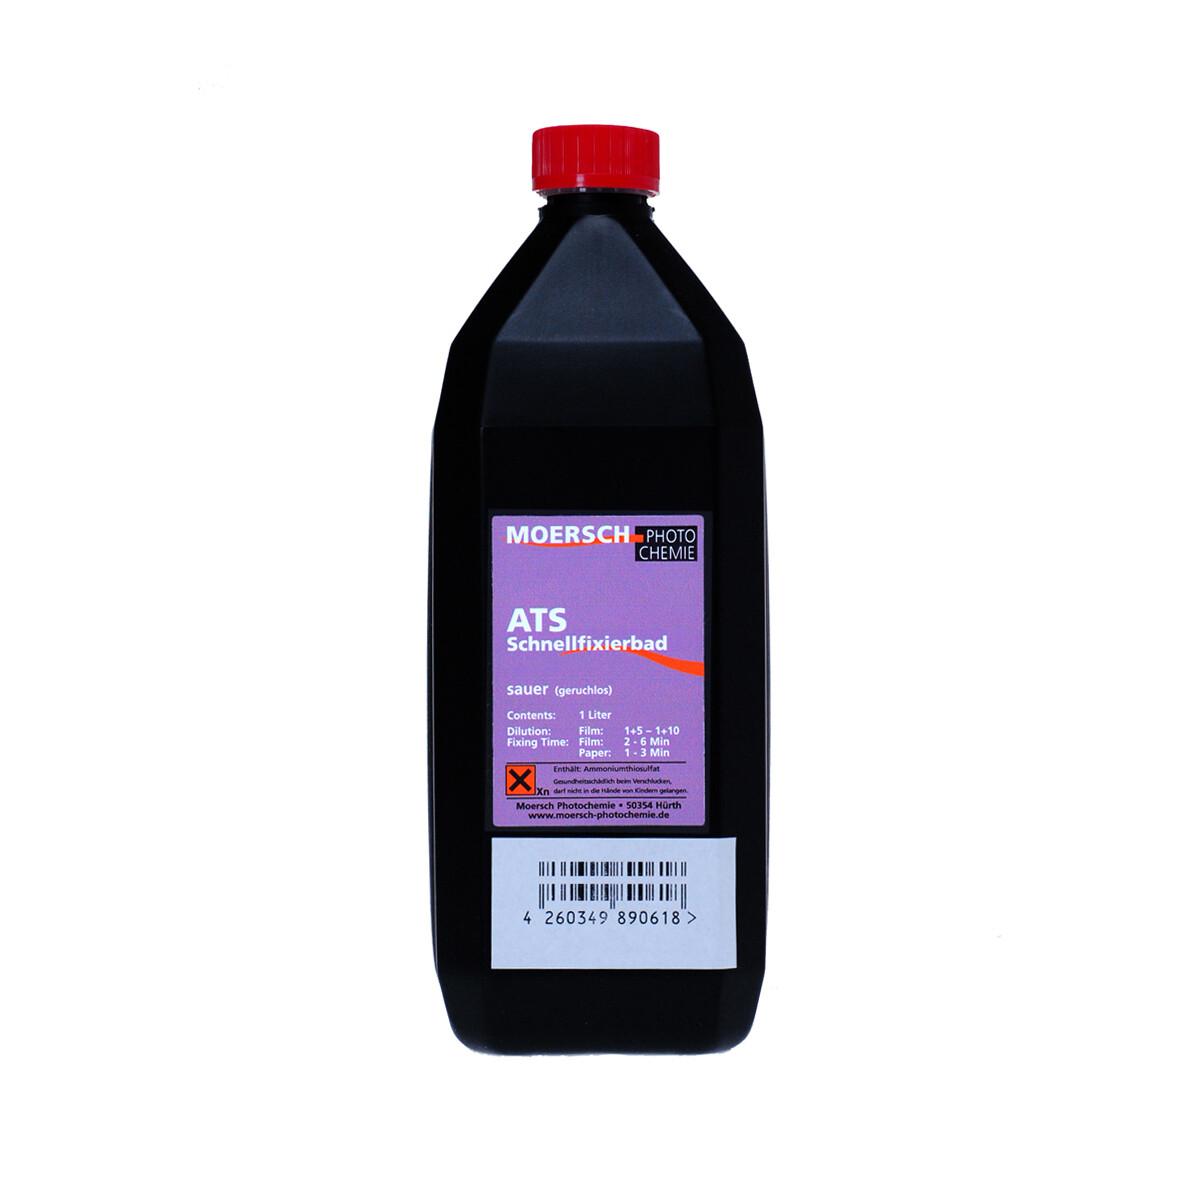 Moersch ATS acidic rapid fixing bath 1 litre concentrate